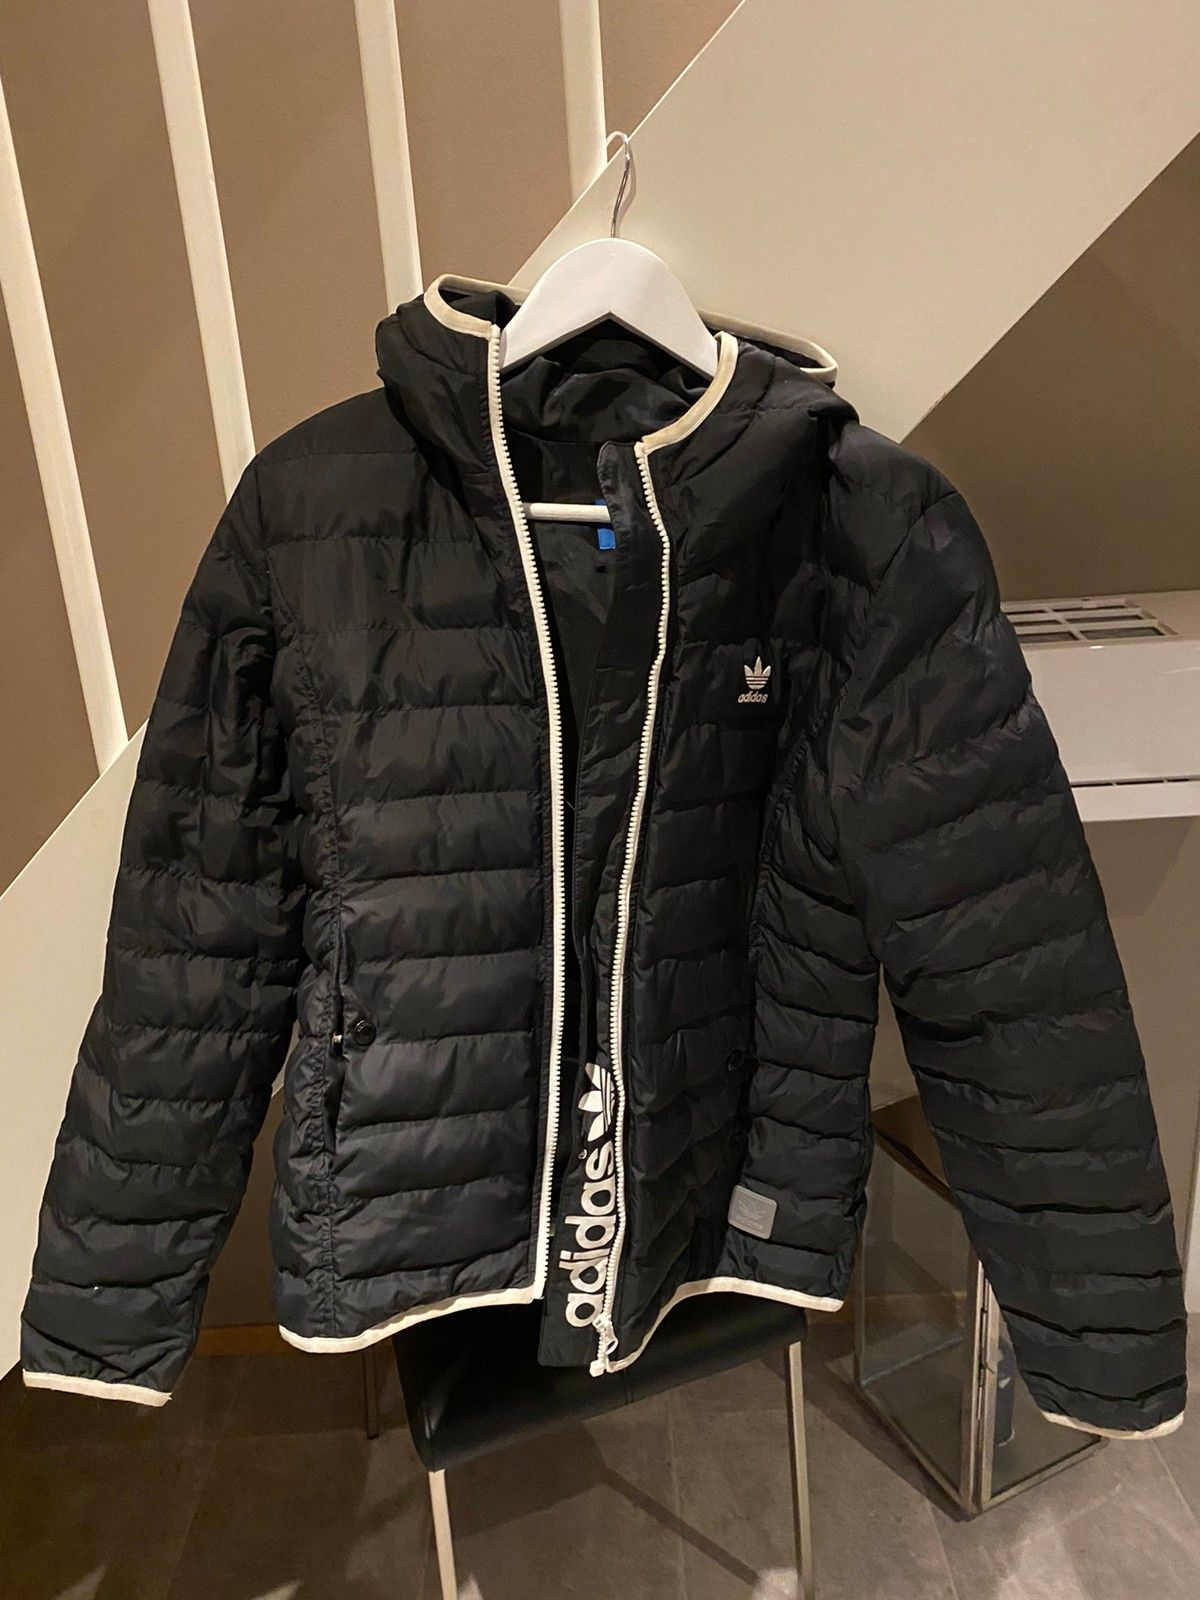 Adidas jakke | FINN.no